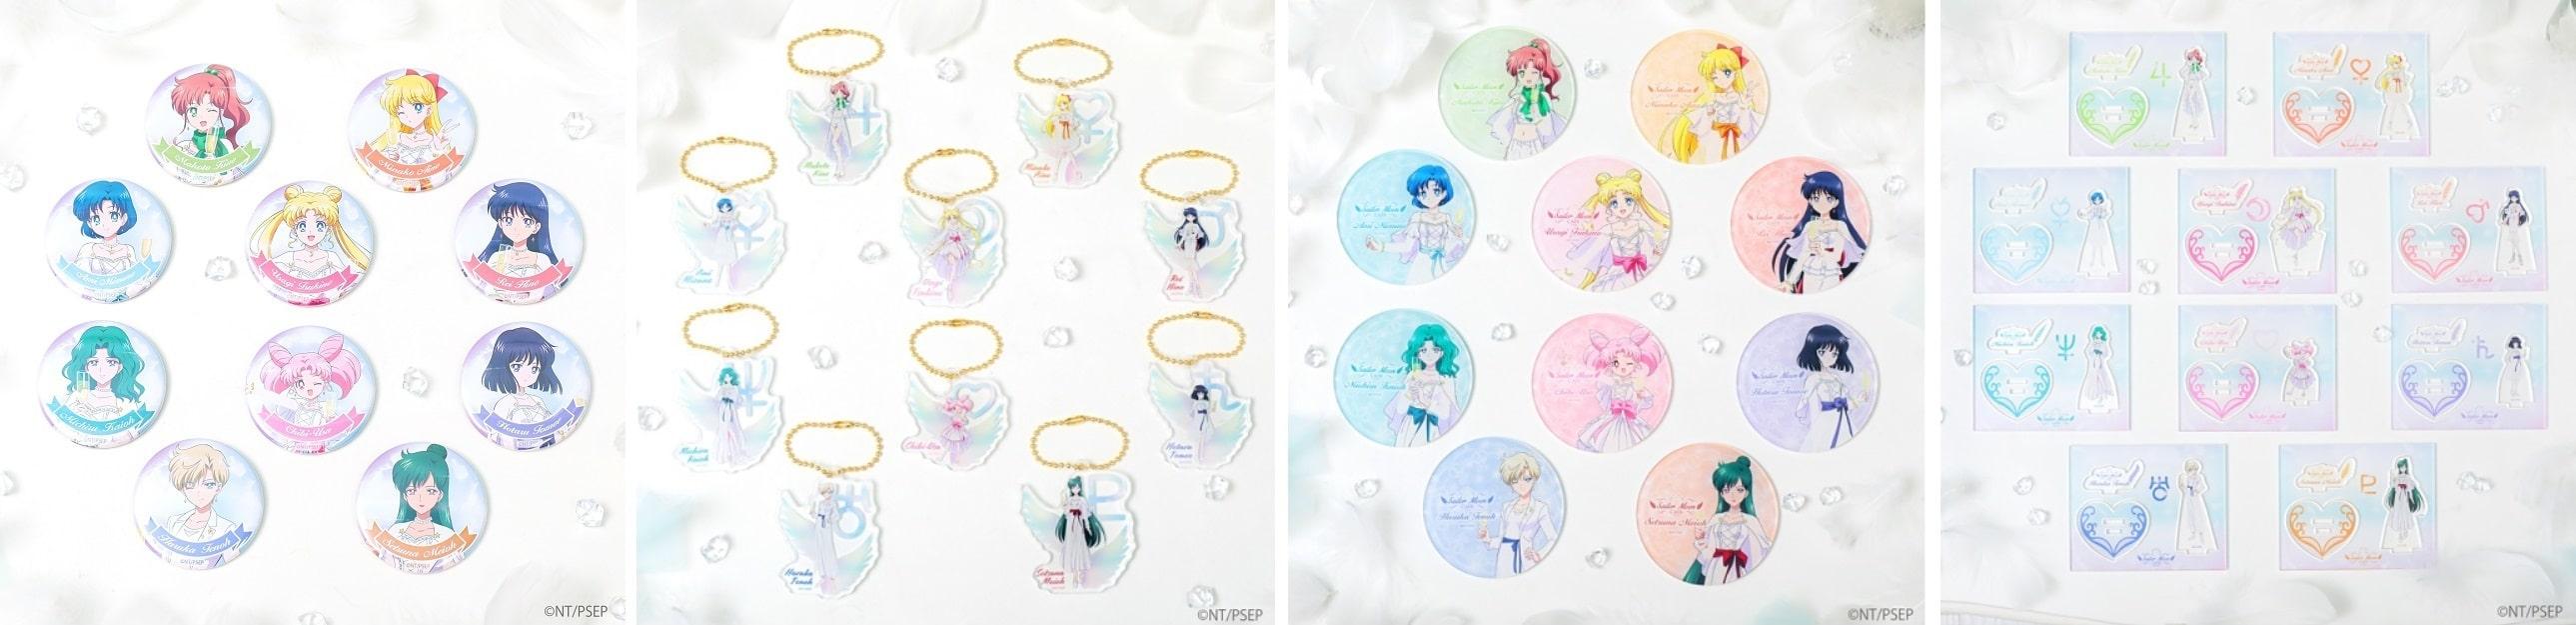 Sailor Moon Eternal Cafe